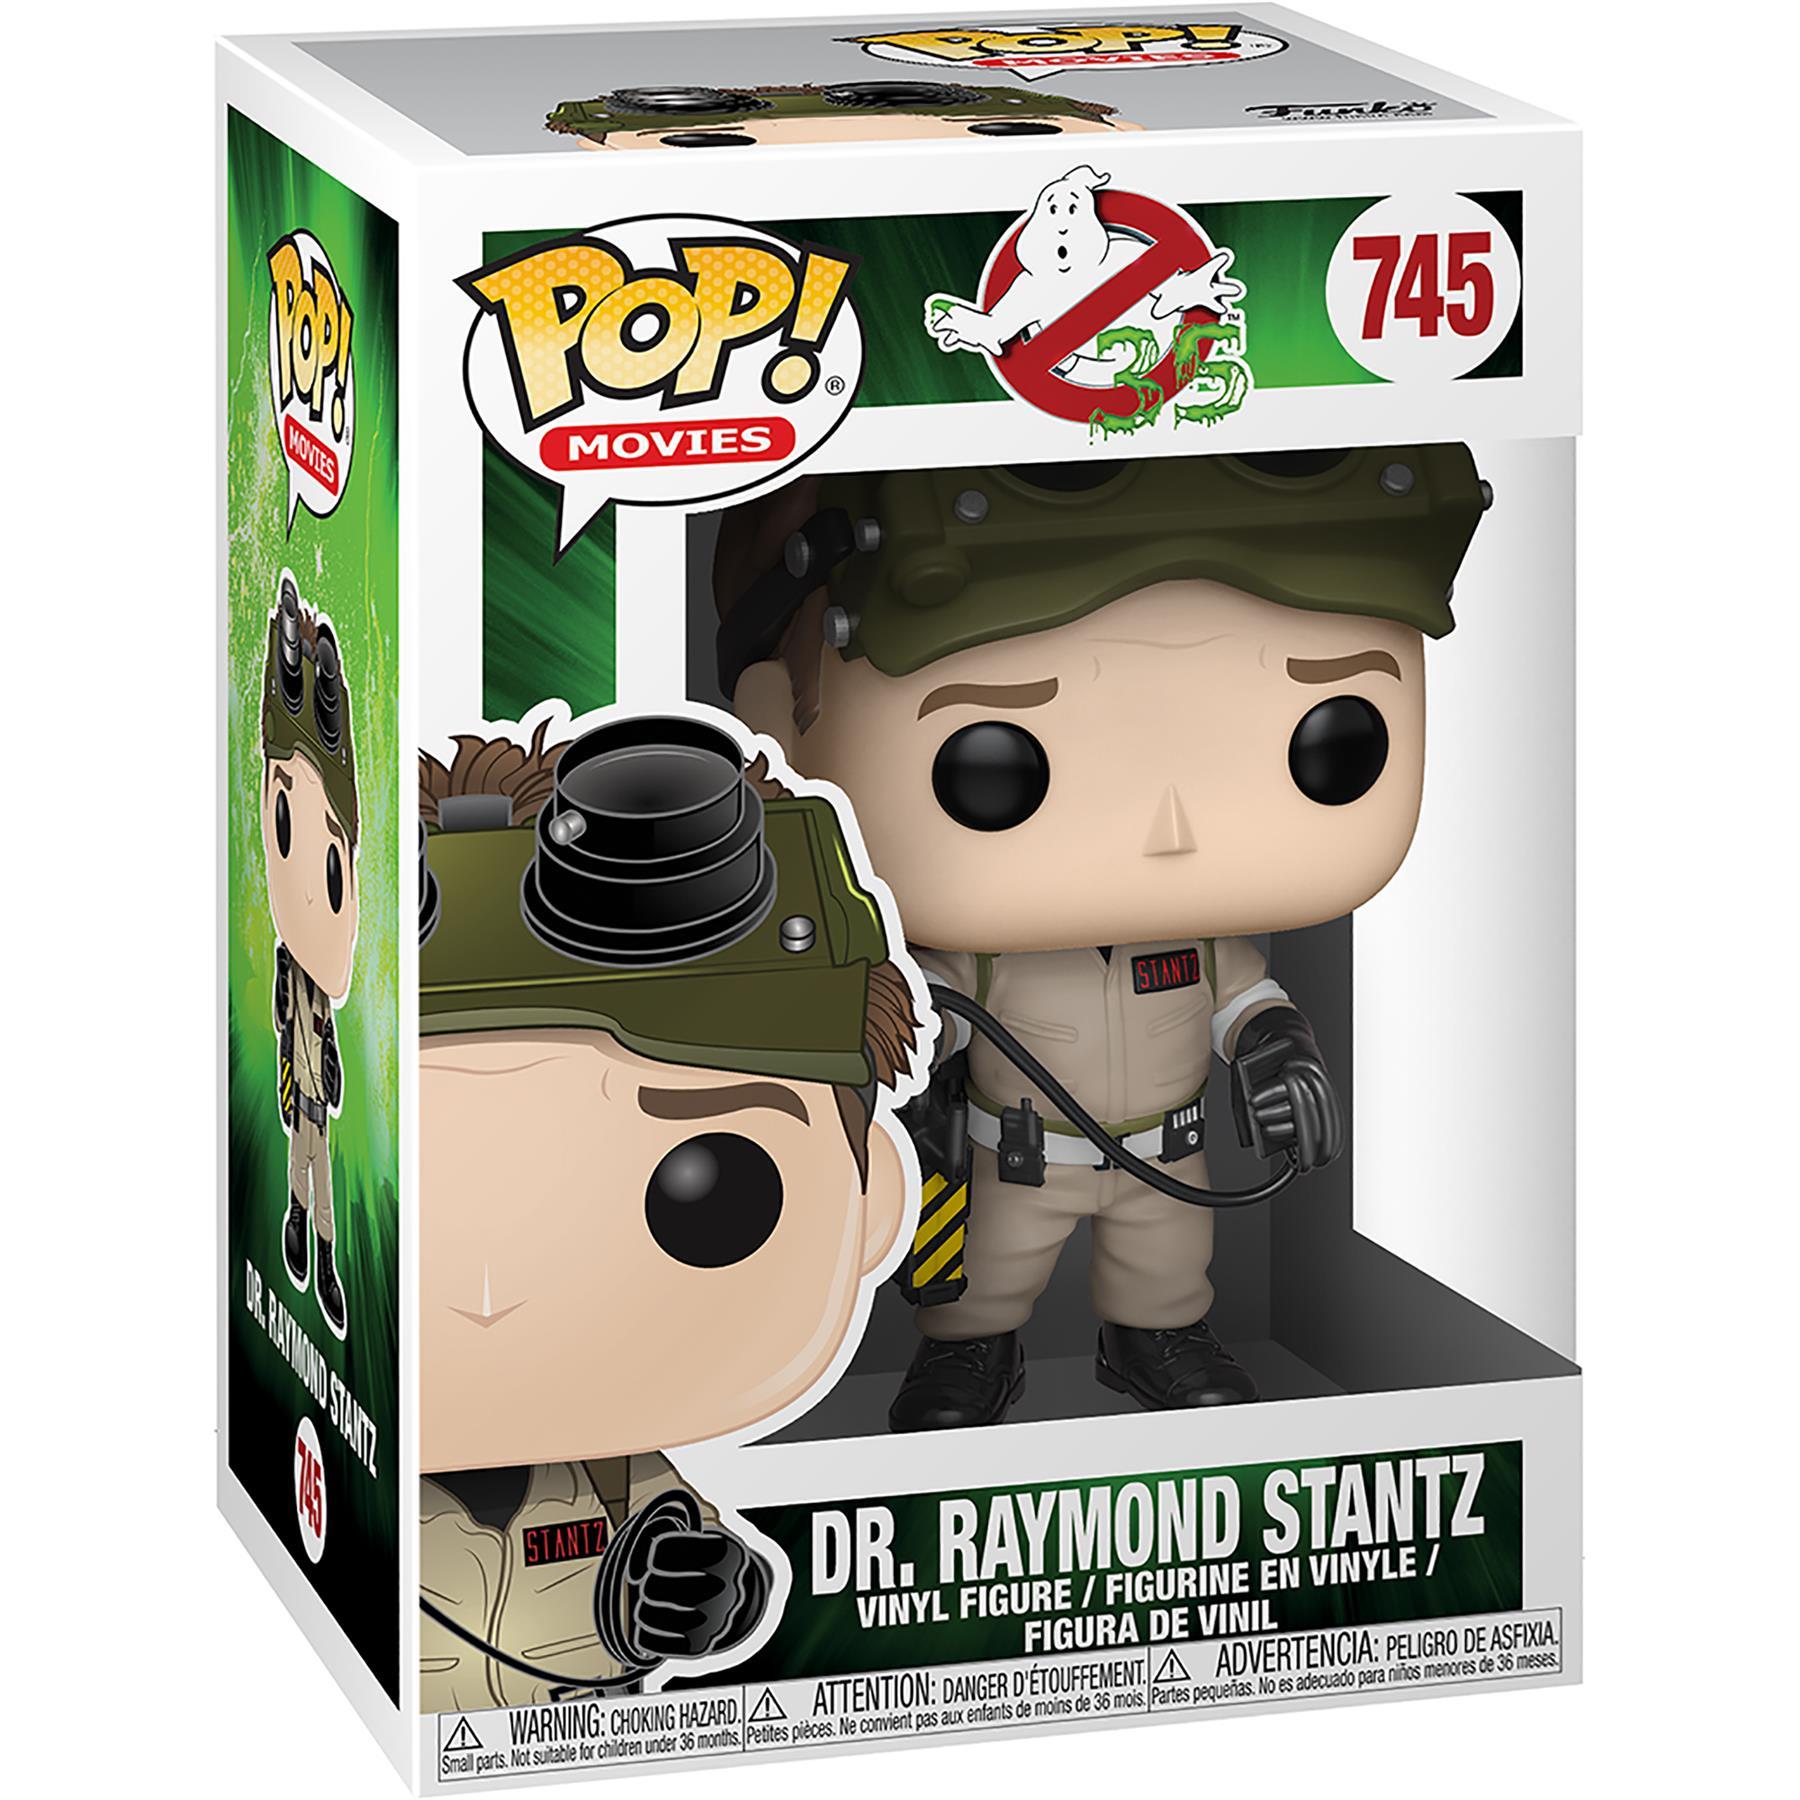 DR Raymond Stantz #745 FUNKO POP Figura 35TH ANNIVERSARIO Ghostbusters film